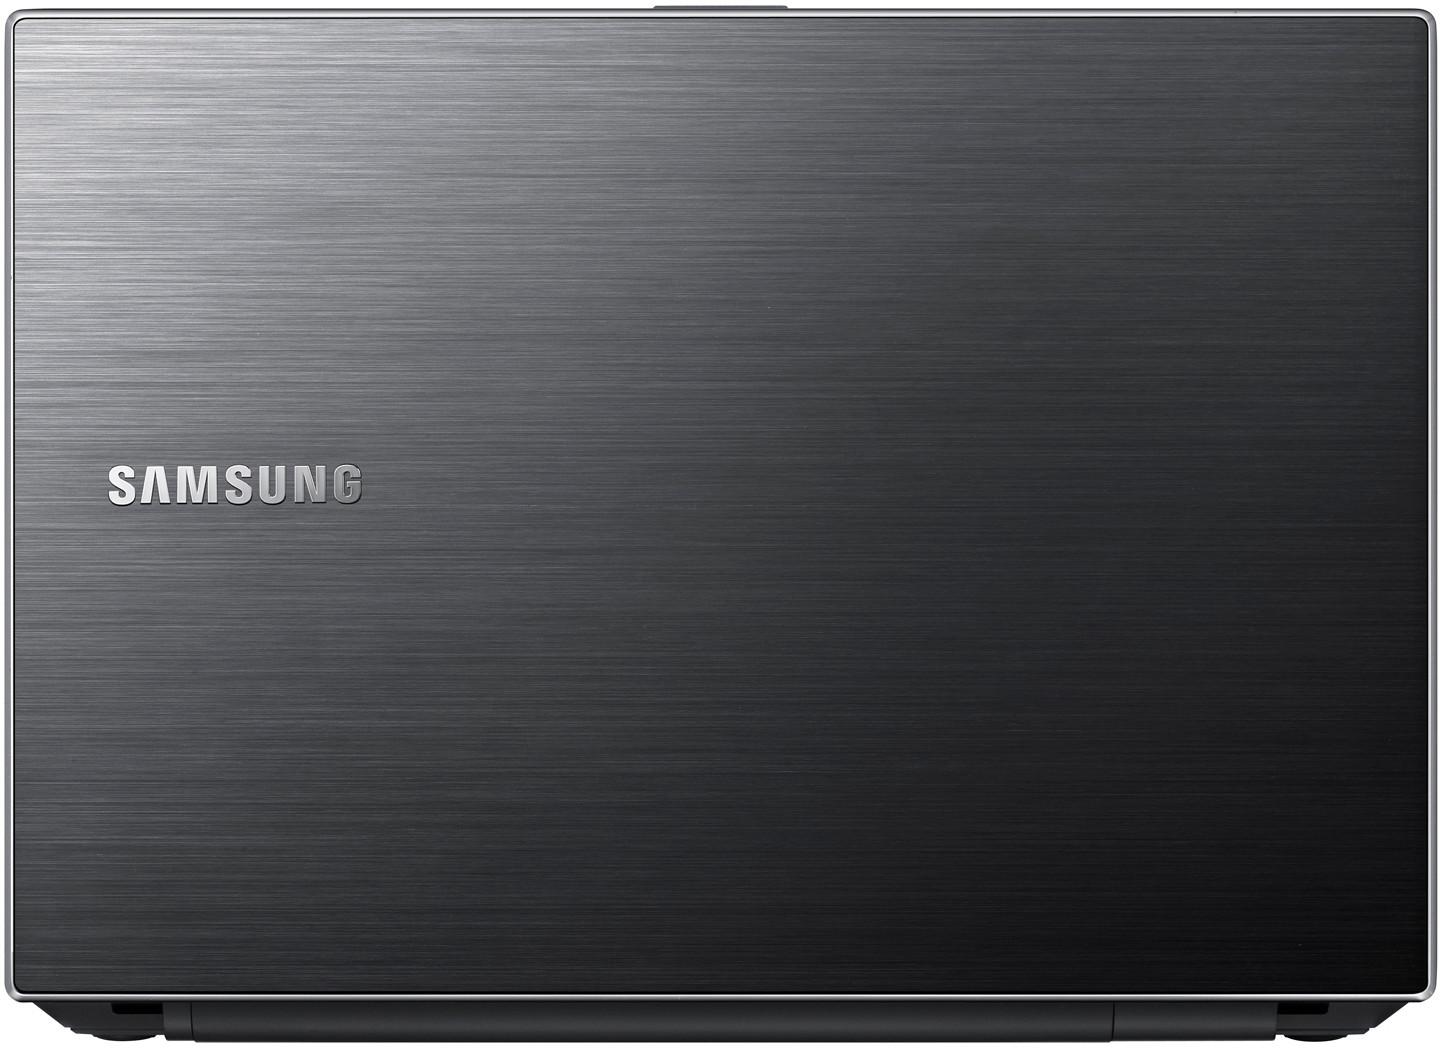 Samsung NP300V3A-S04NL